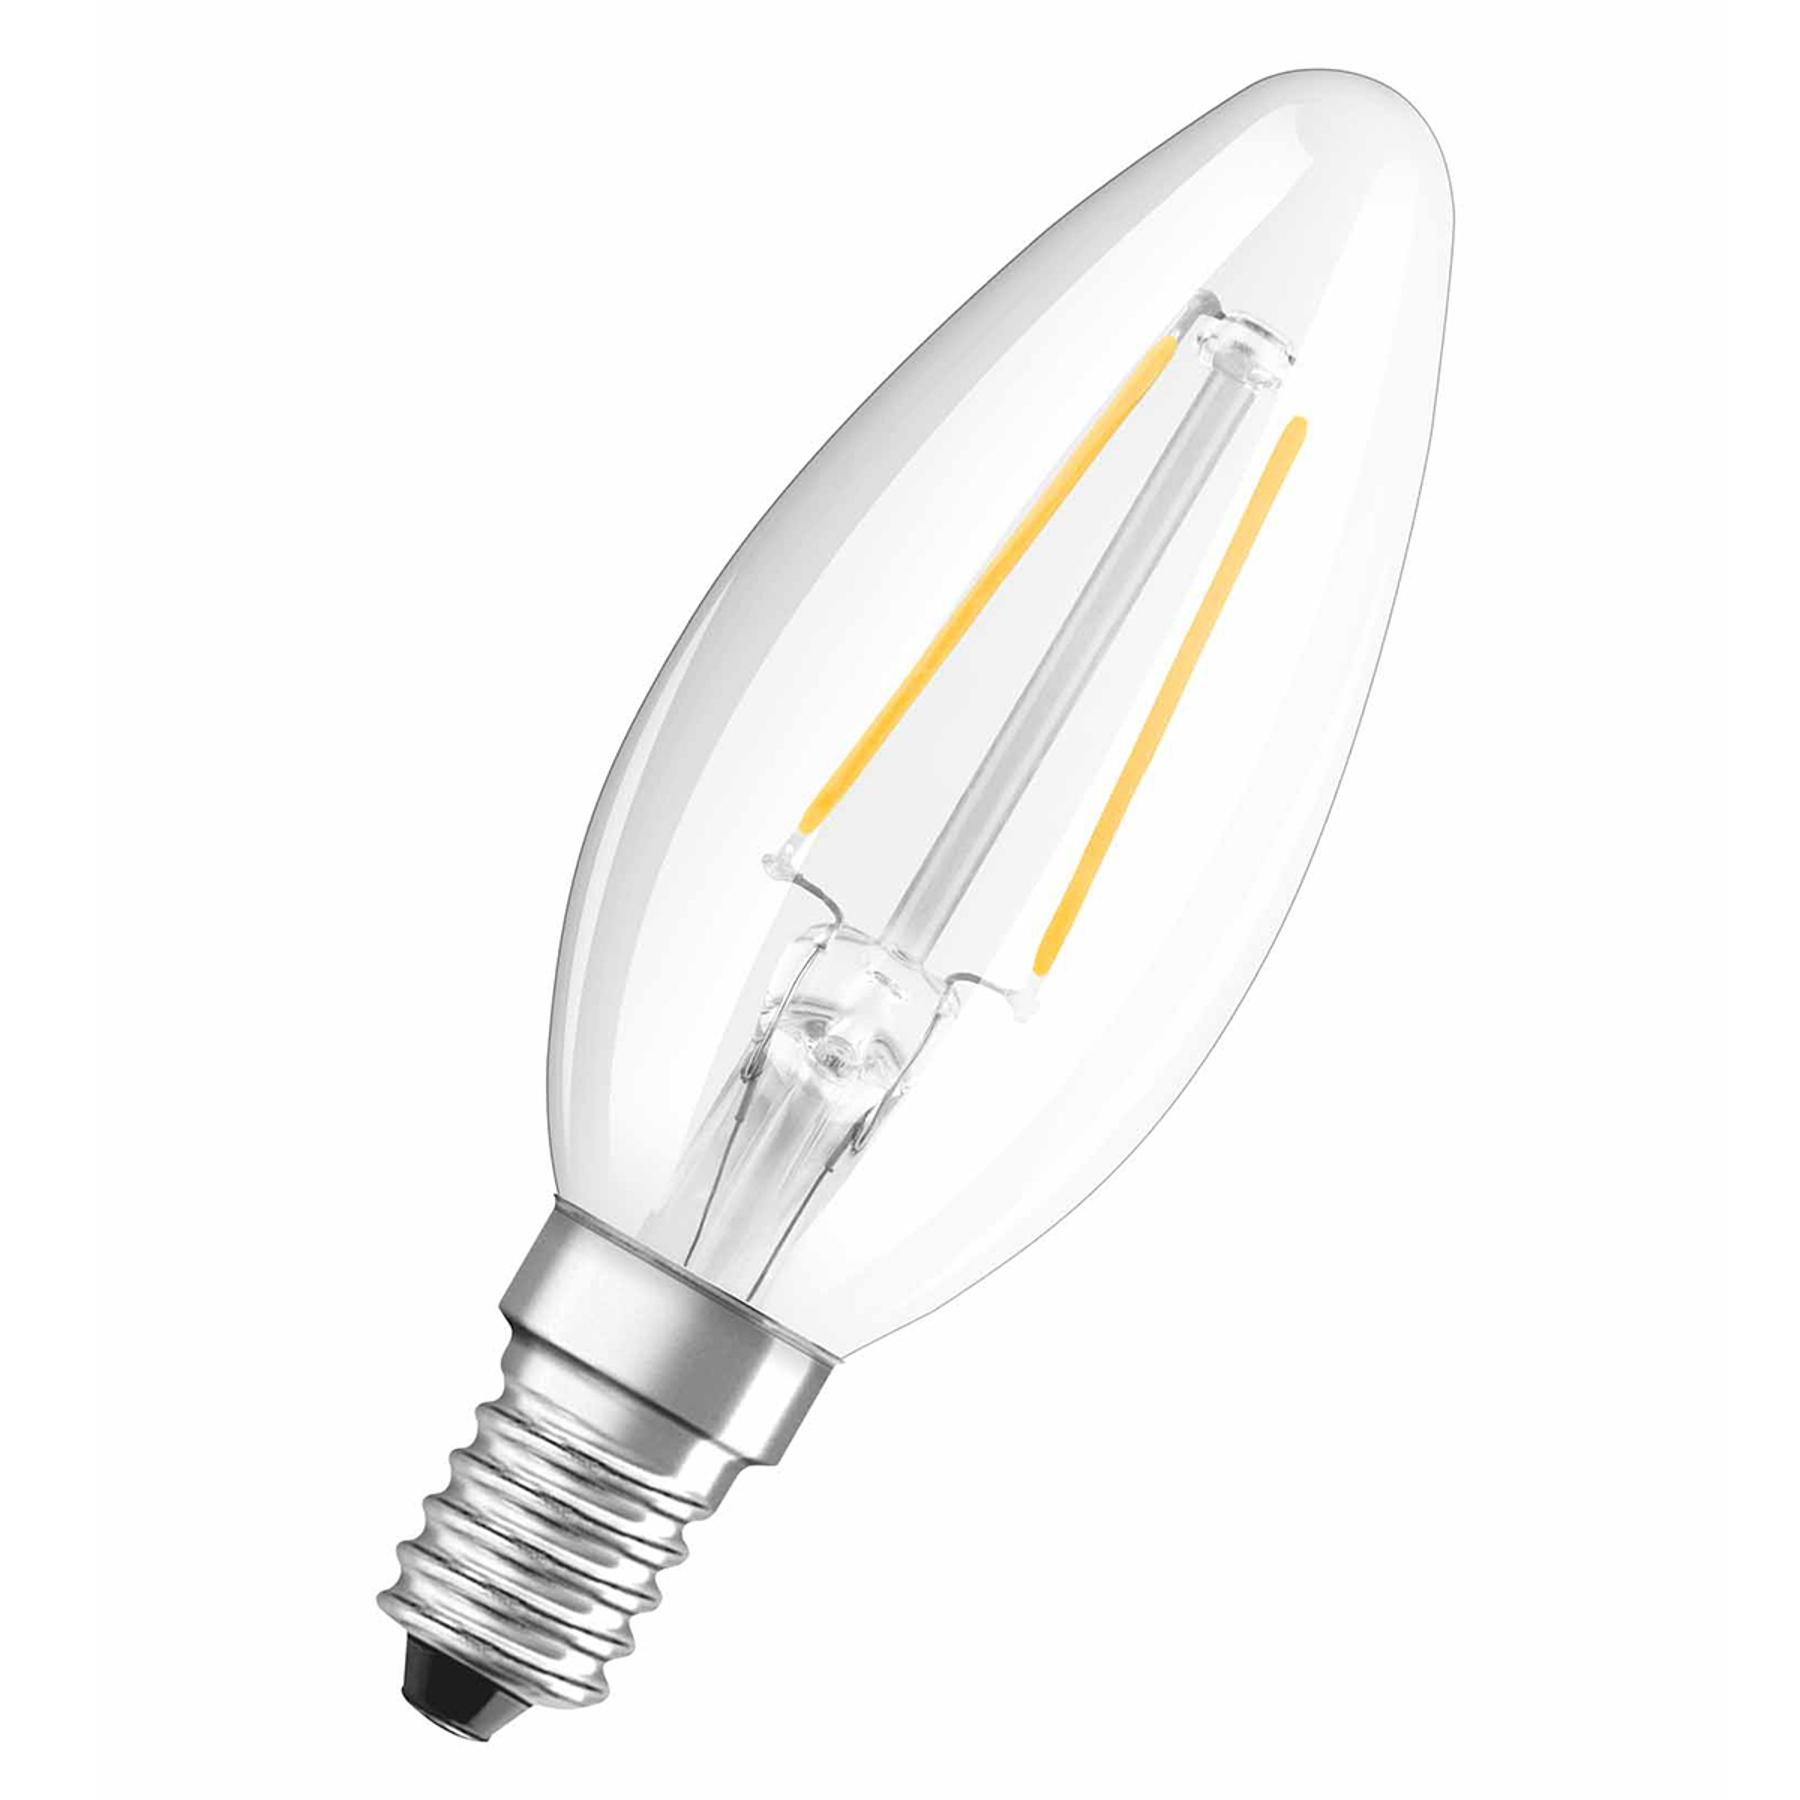 OSRAM-LED-kynttilälamppu E14 1,5W 827 Retrofit